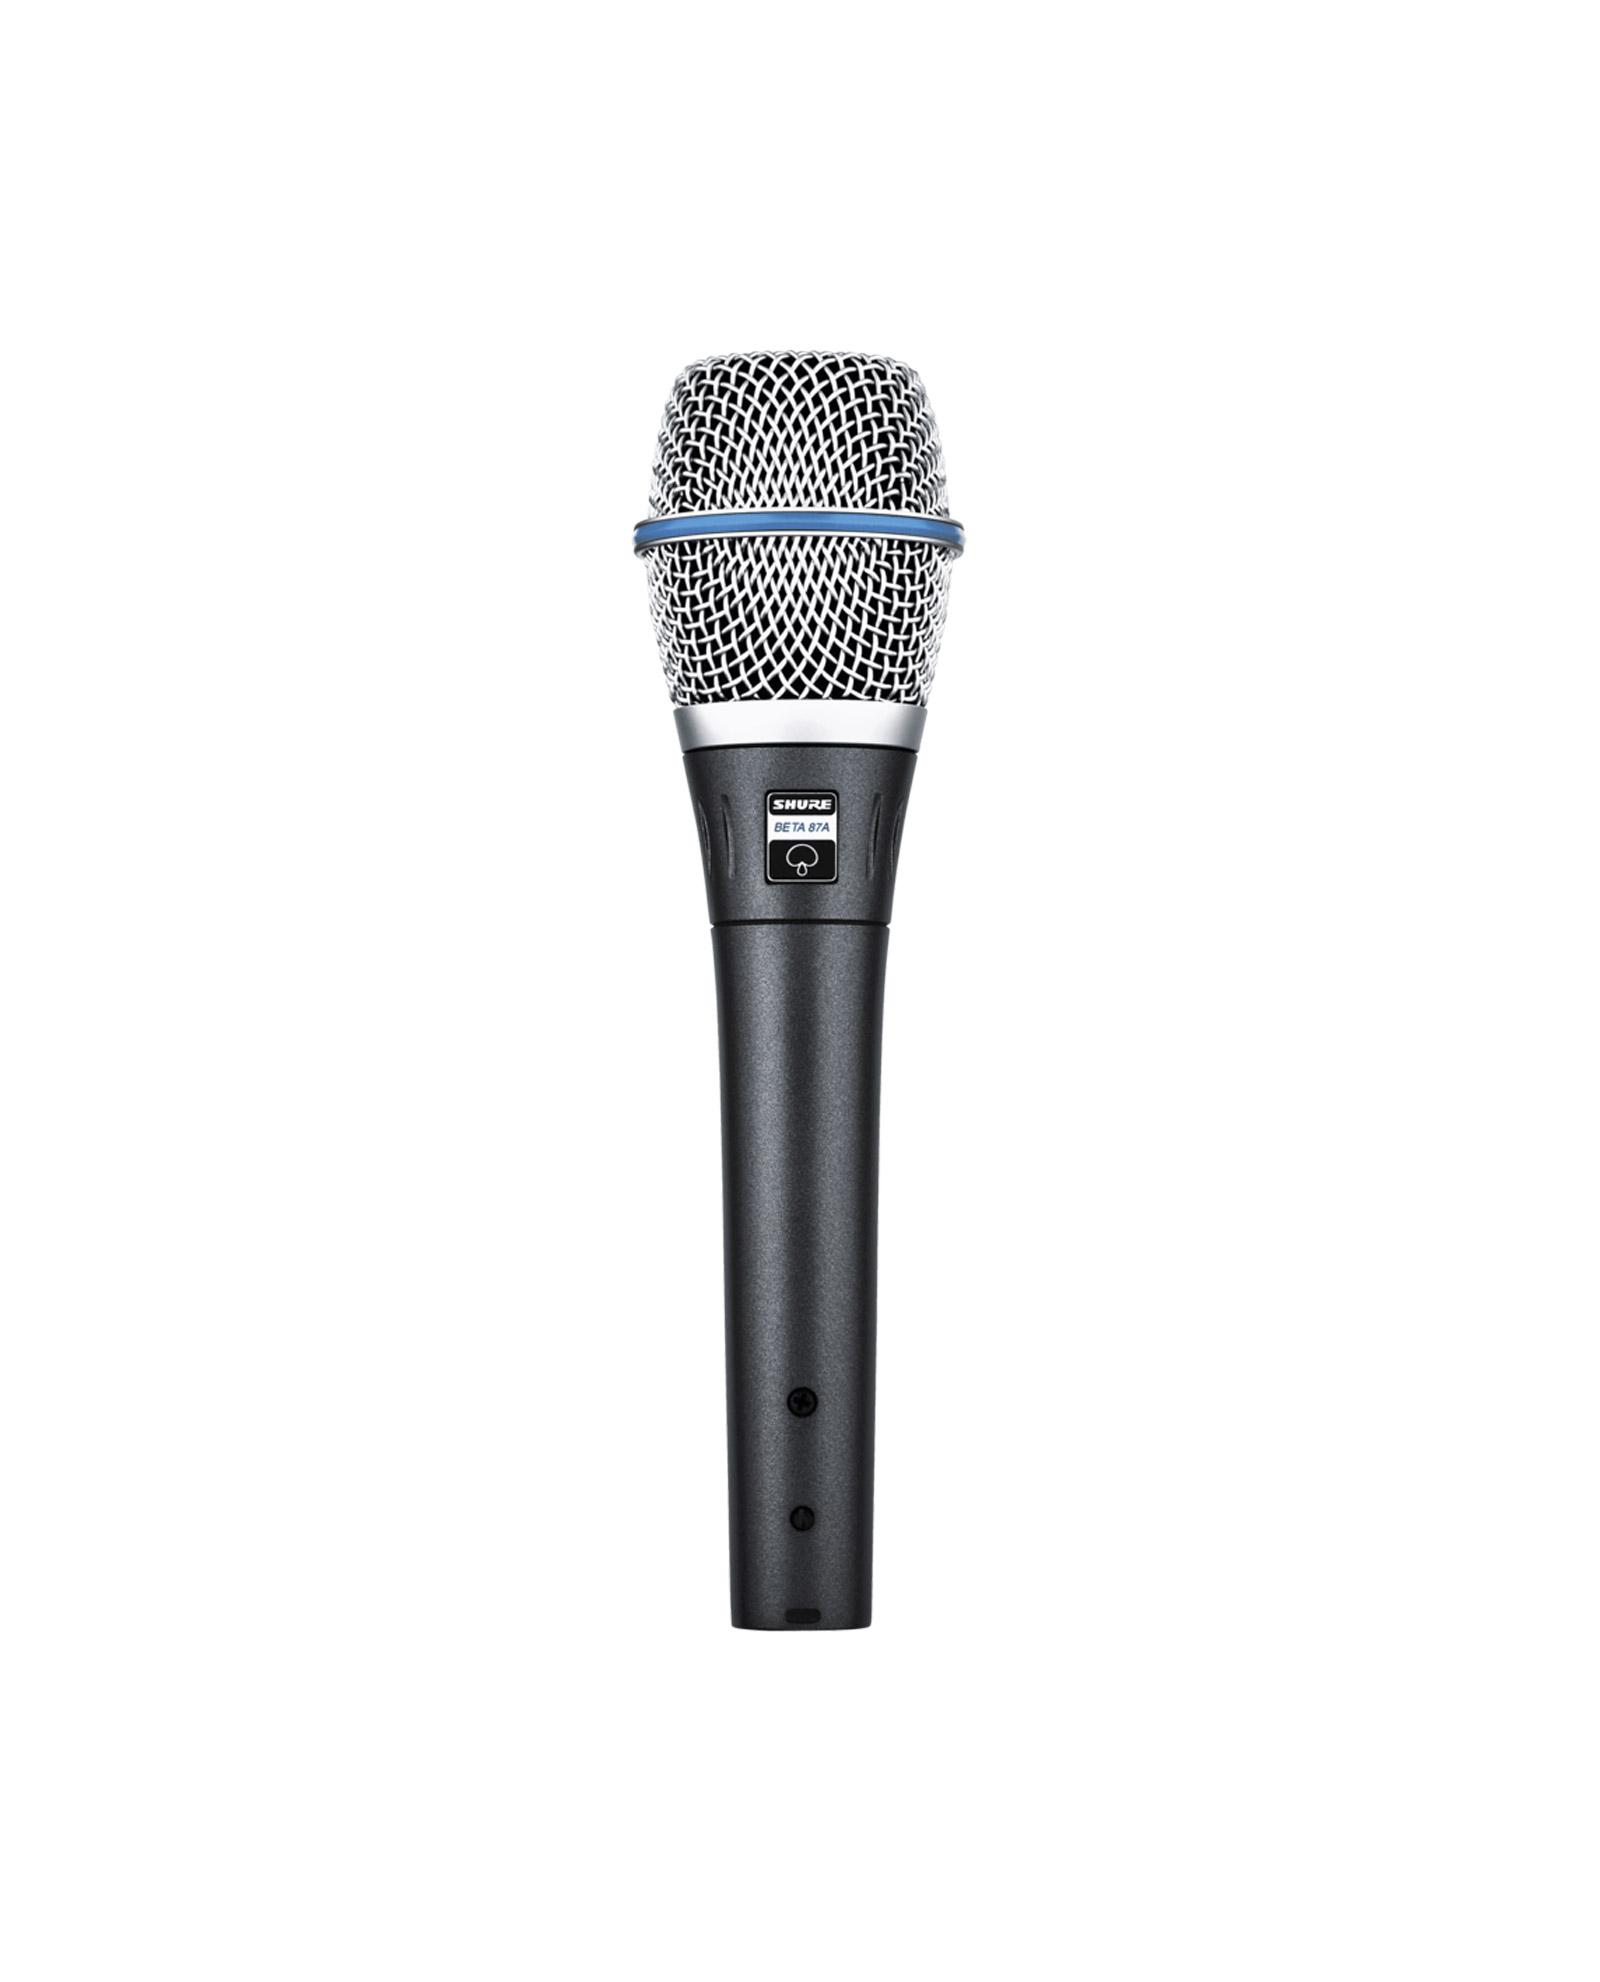 Shure Beta 87a Vocal Microphone 1